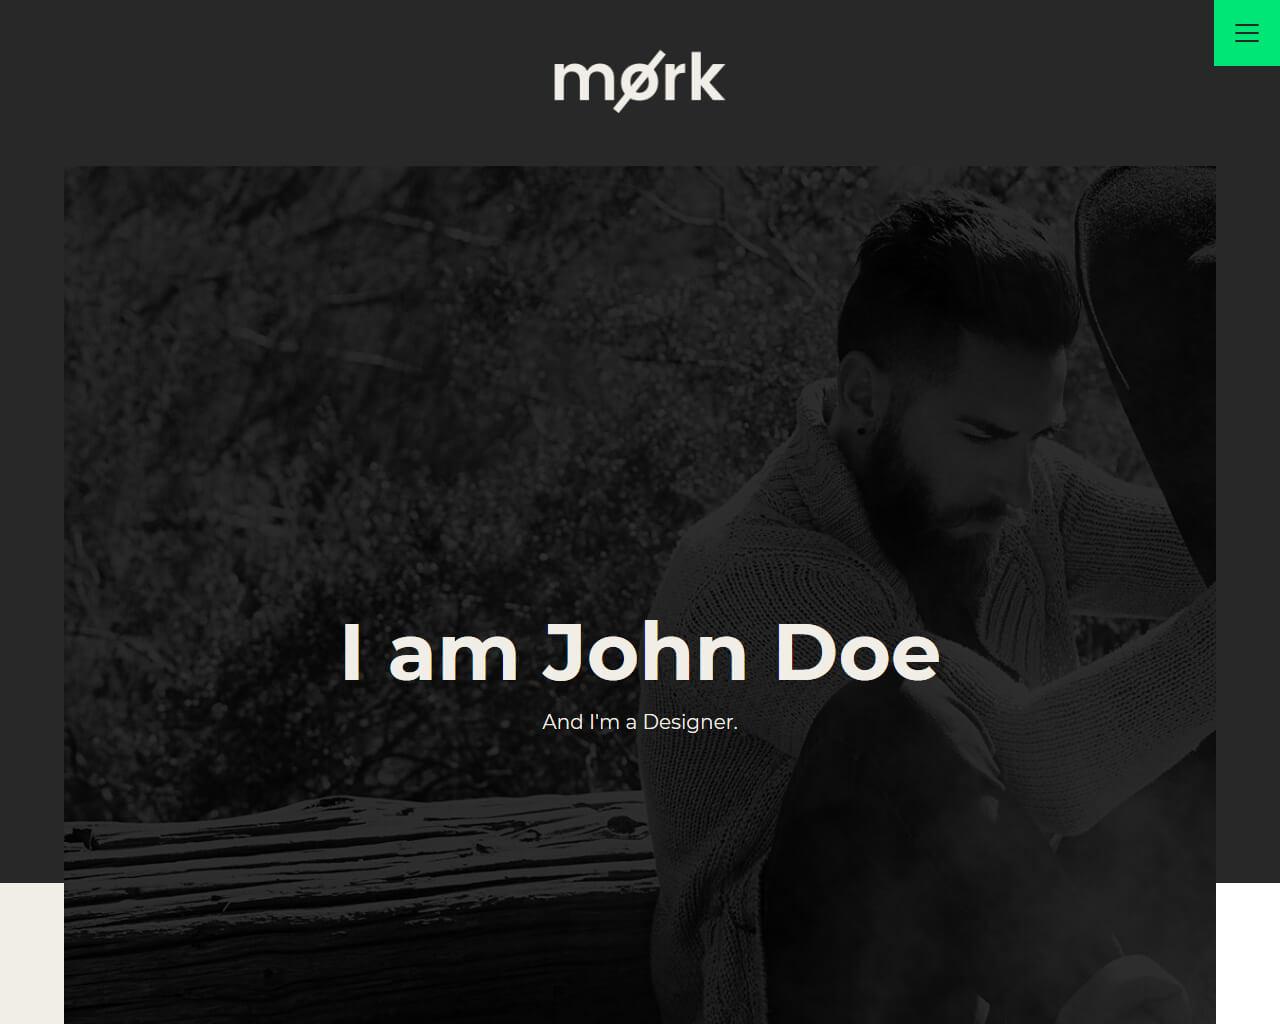 Mork Website Template